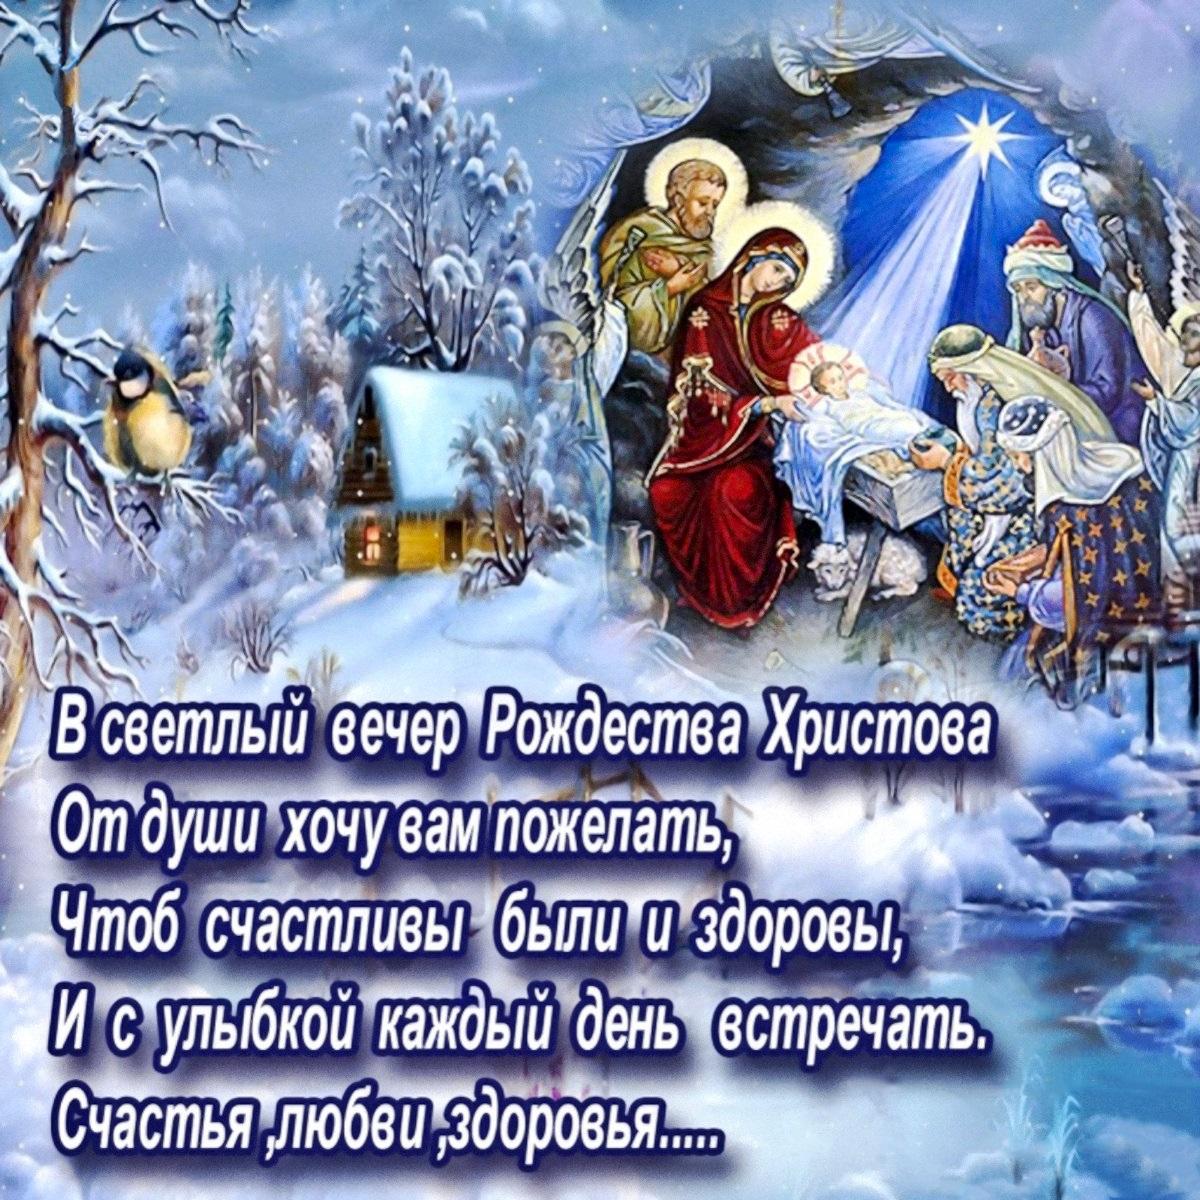 00-christmas-russia-080117